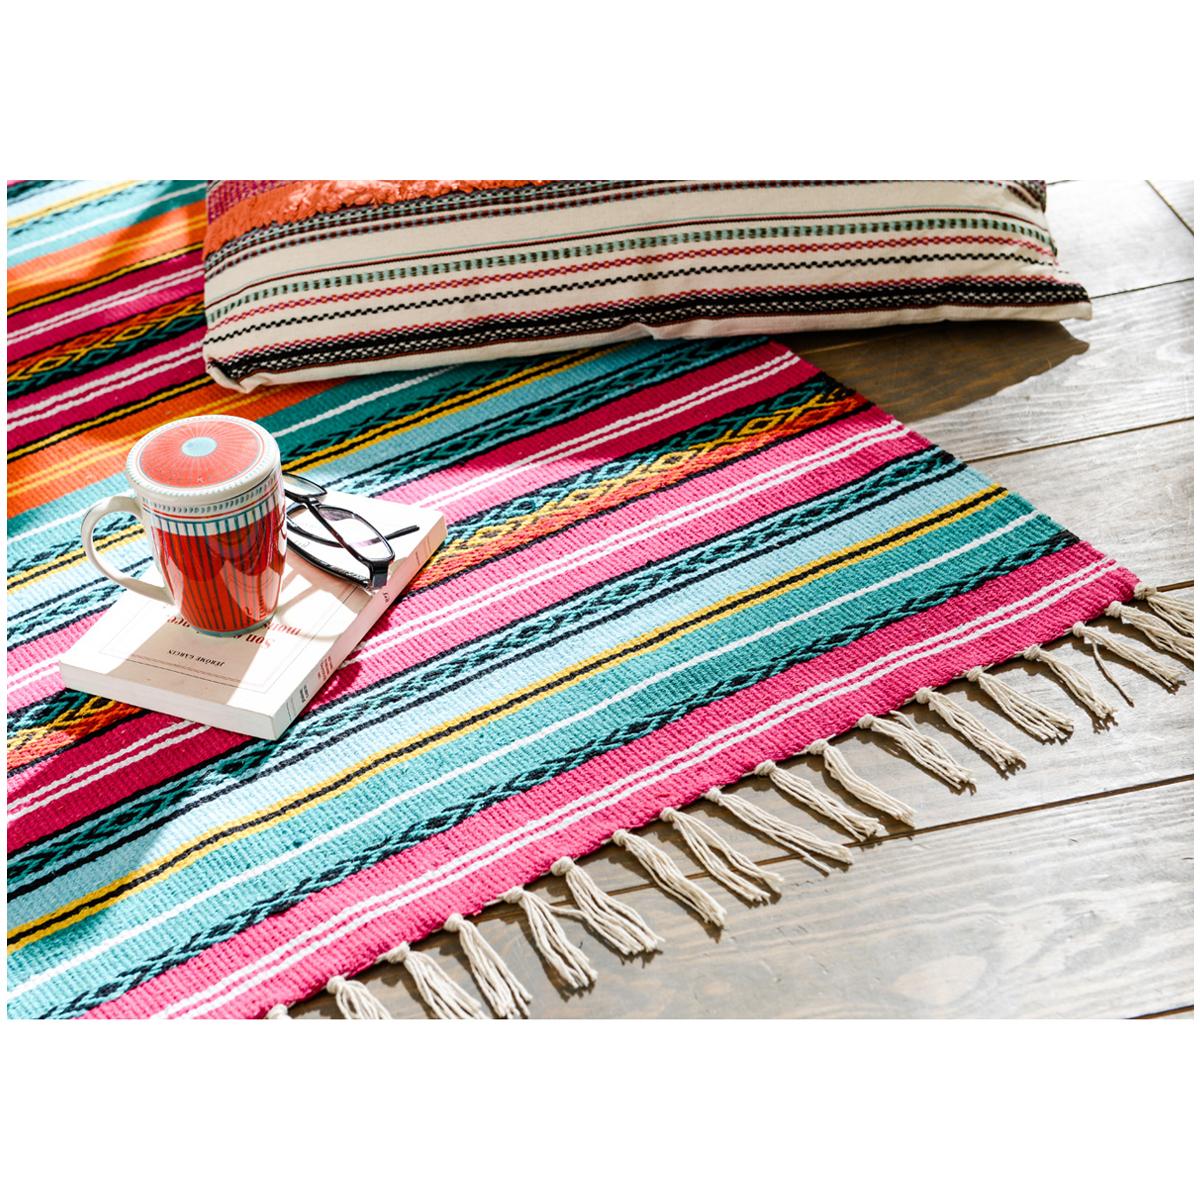 Tapis coton \'Boho\' multicolore - 90x60 cm - [Q9626]